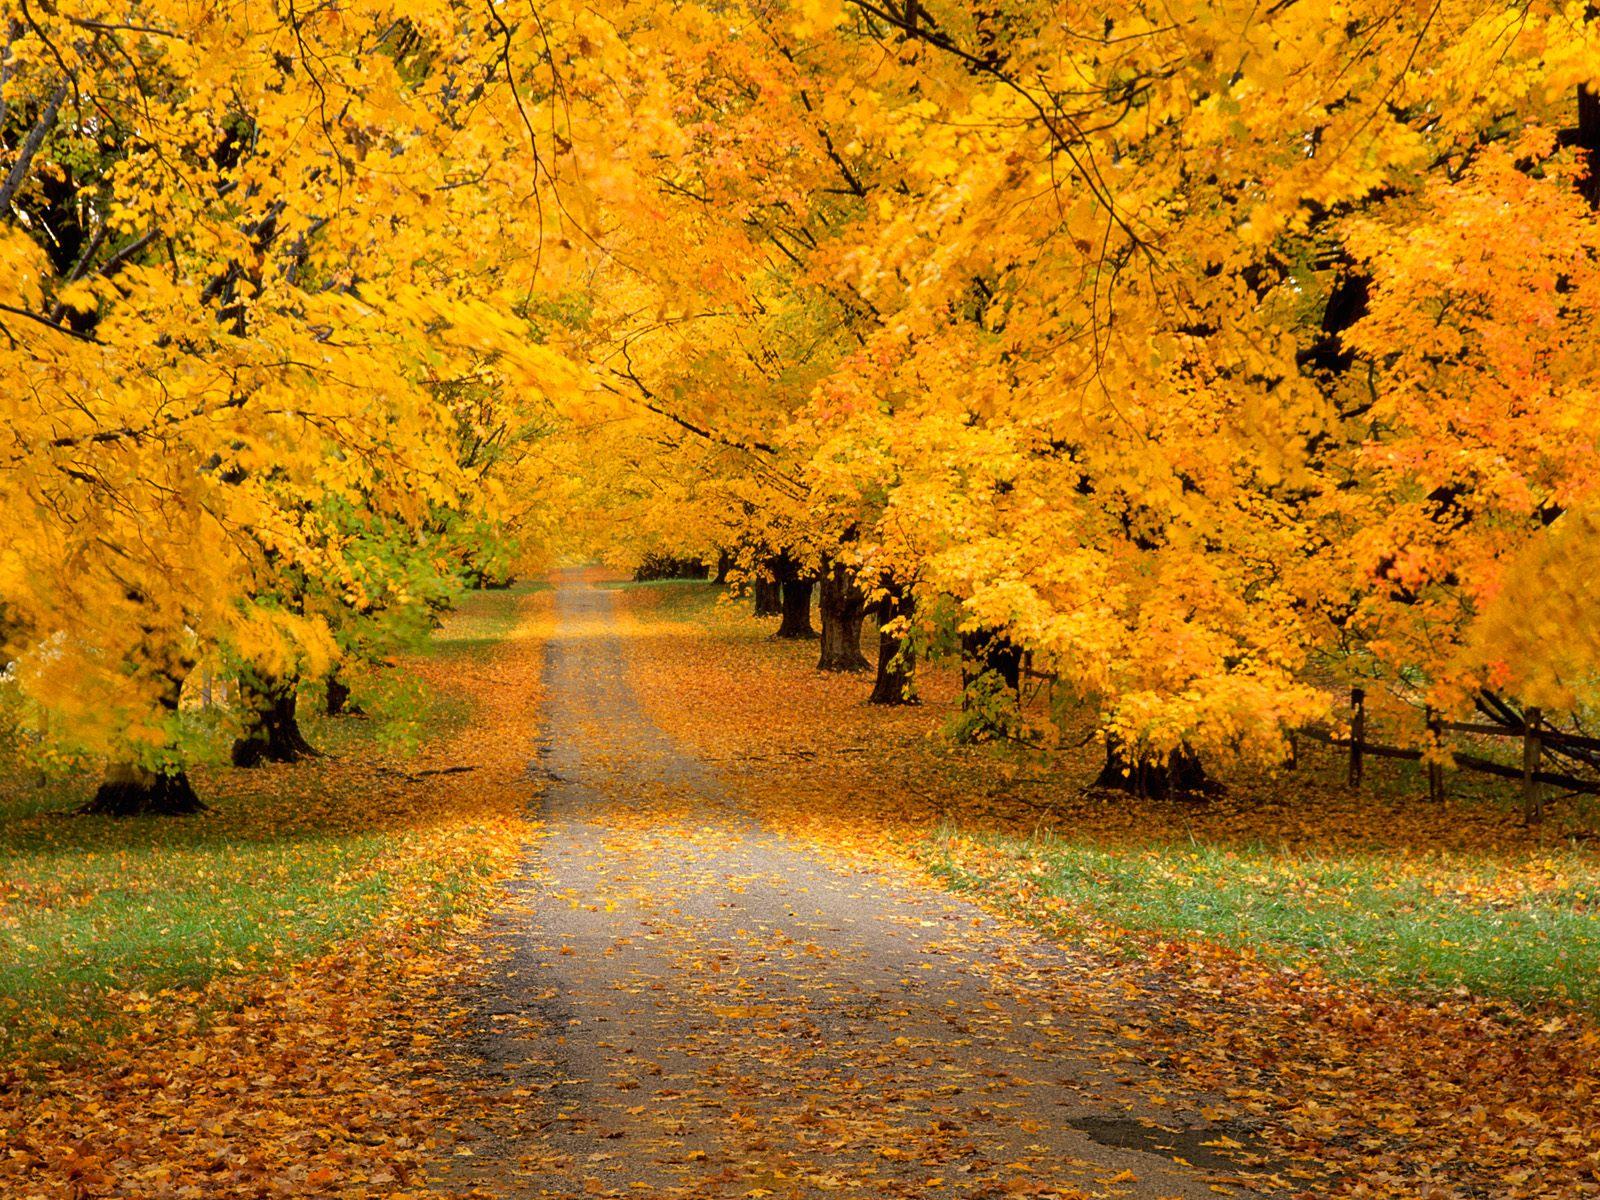 http://3.bp.blogspot.com/_j-5leje8ehE/TF9fkL6d7gI/AAAAAAAAB1s/kOwPgiO2mgk/s1600/Autumn_wallpaper.jpg